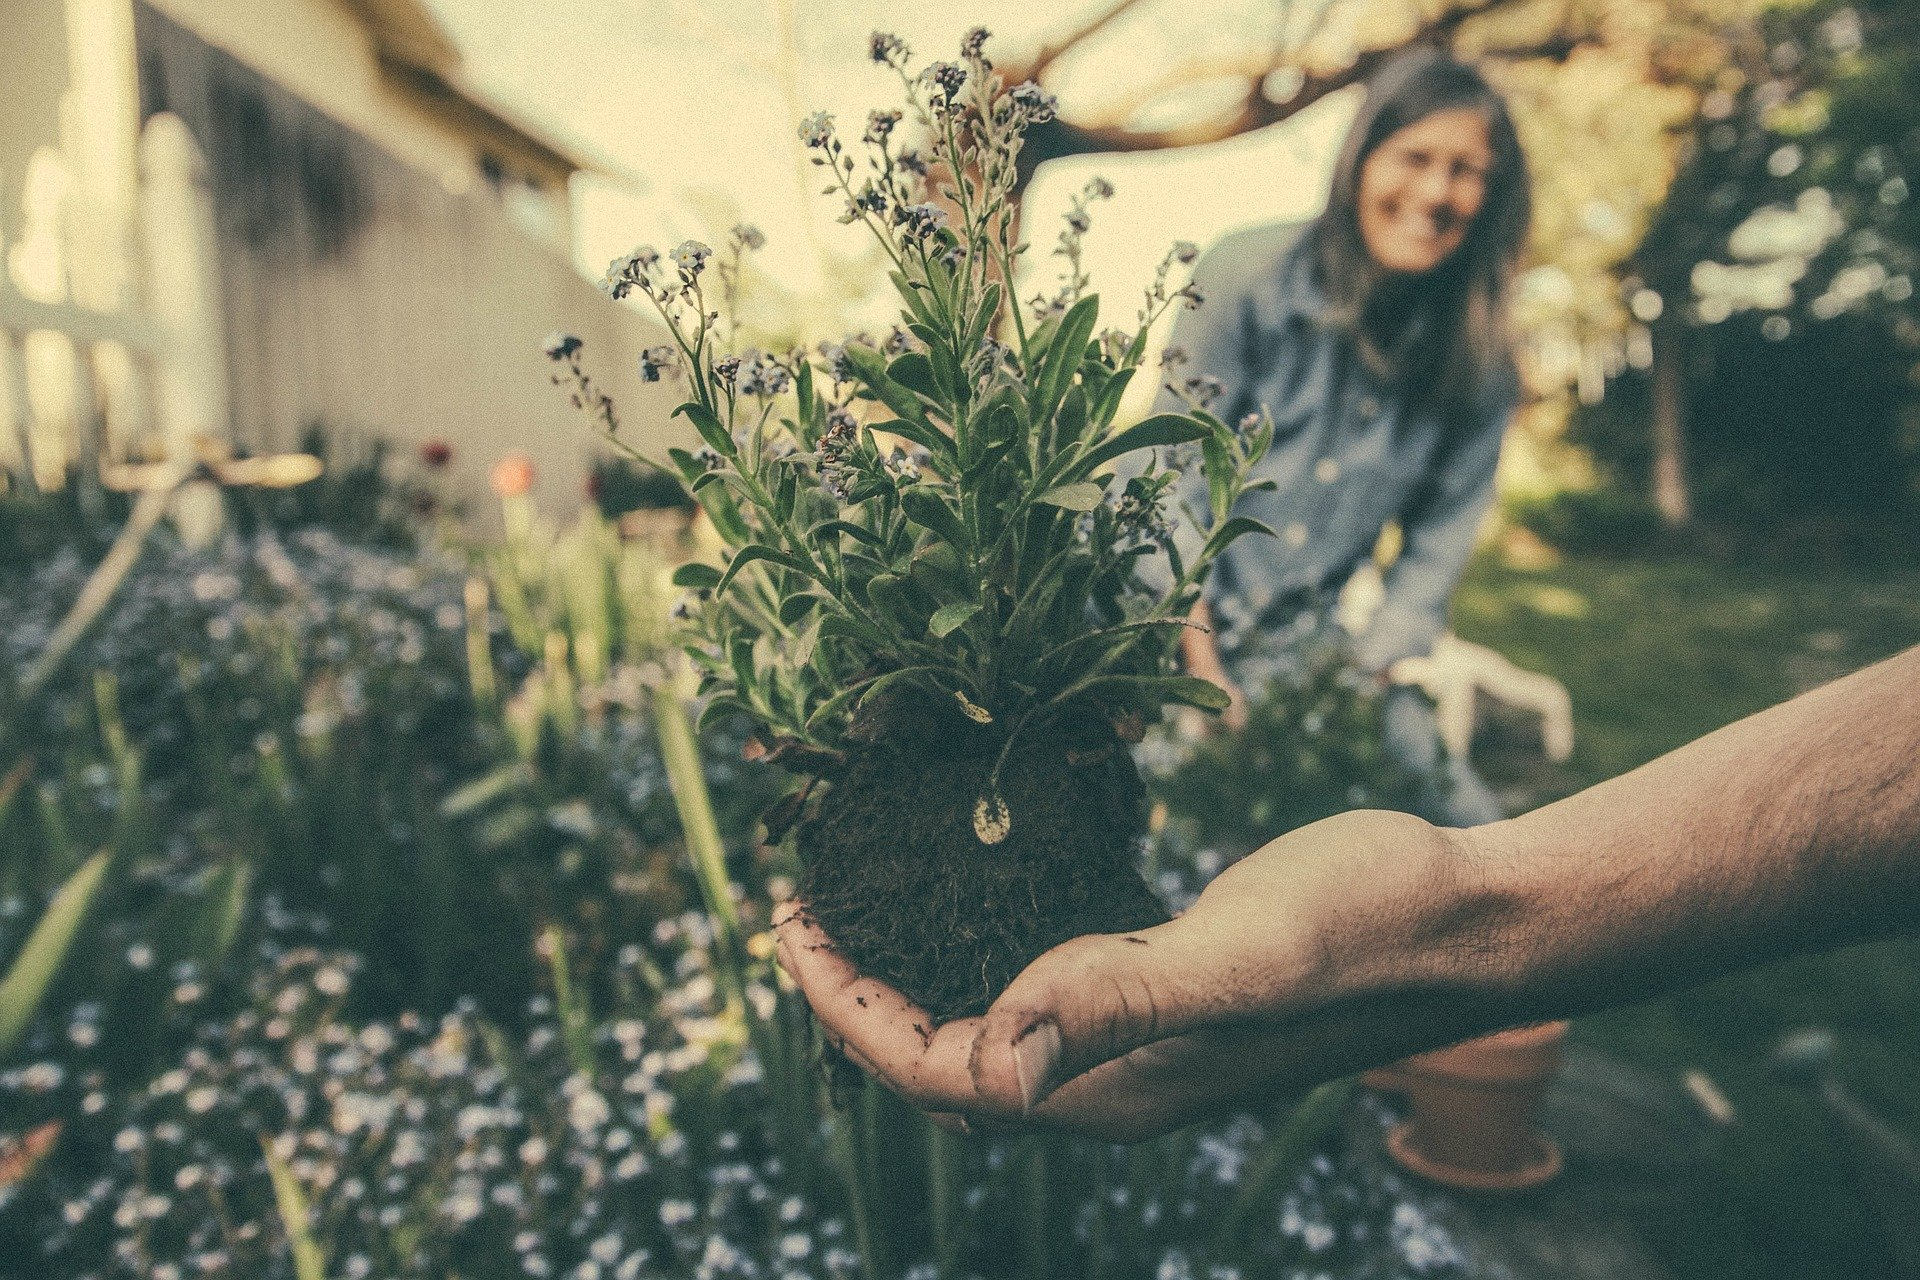 Hand Picking Up Flower